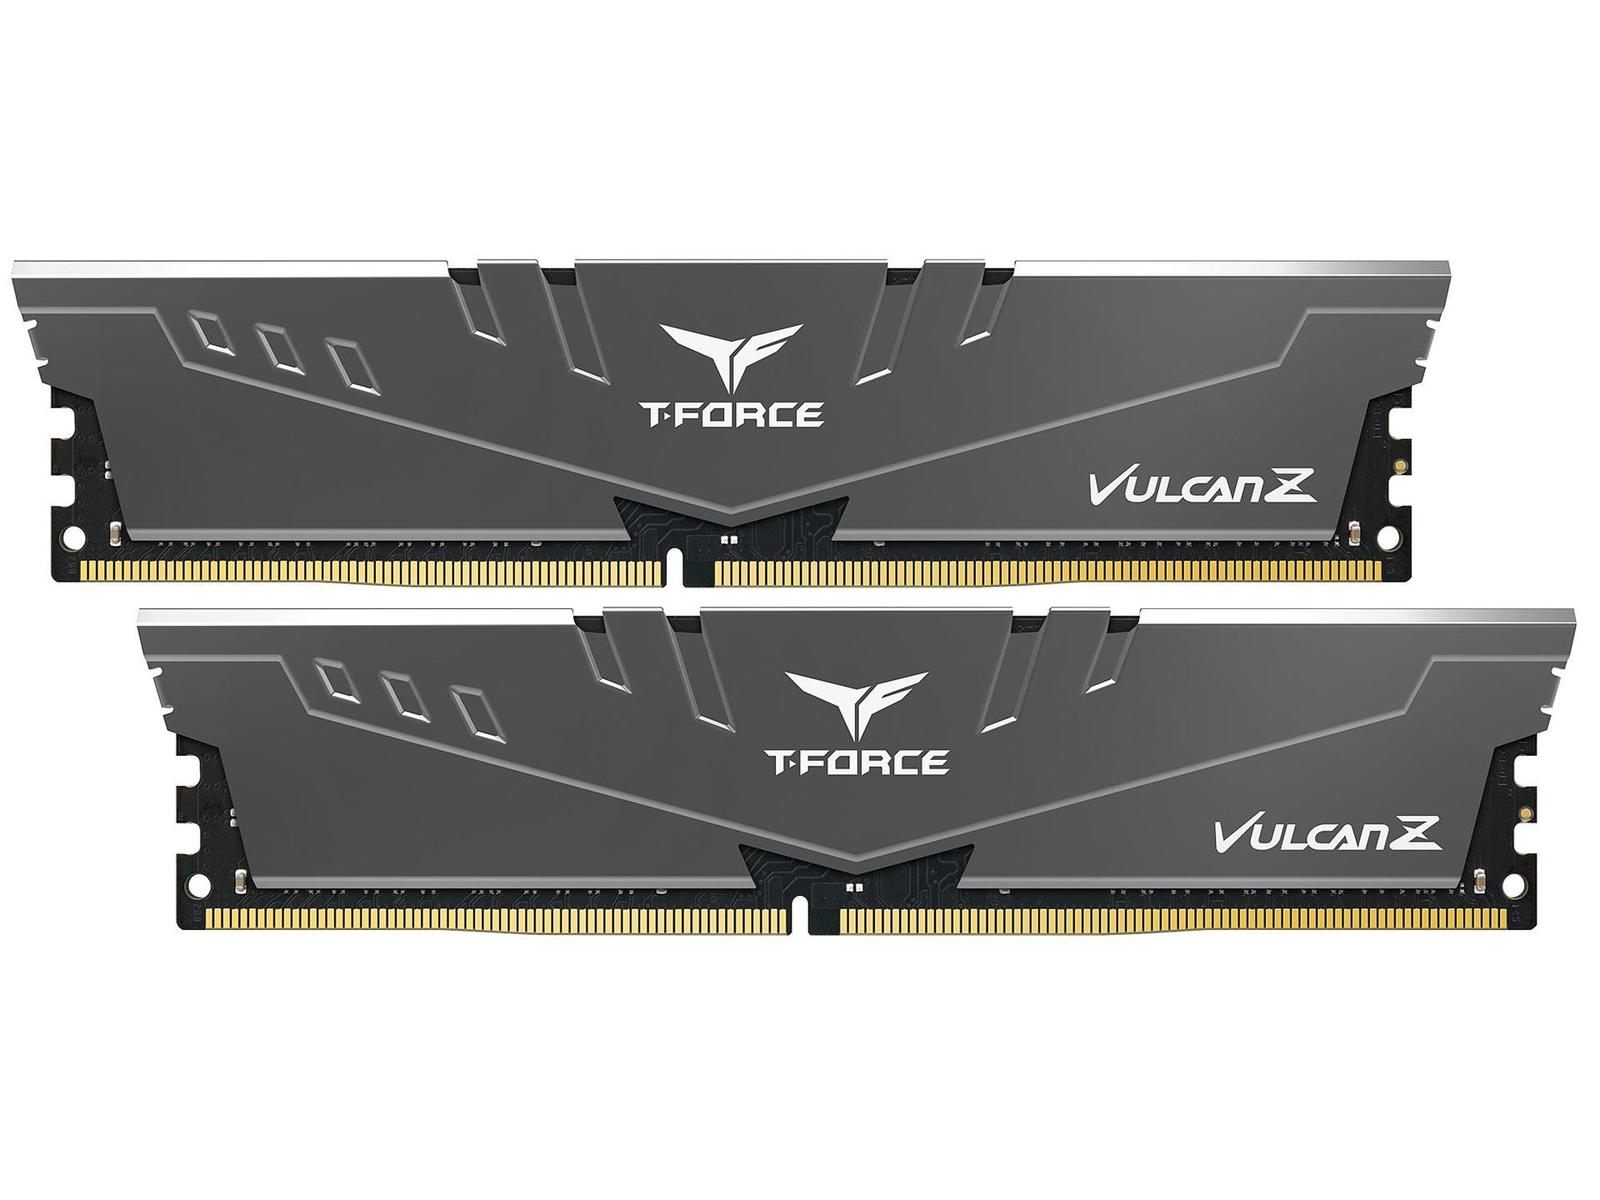 Team T-FORCE VULCAN Z 32 GB (2 x 16 GB) DDR4-3200 CL16 Memory